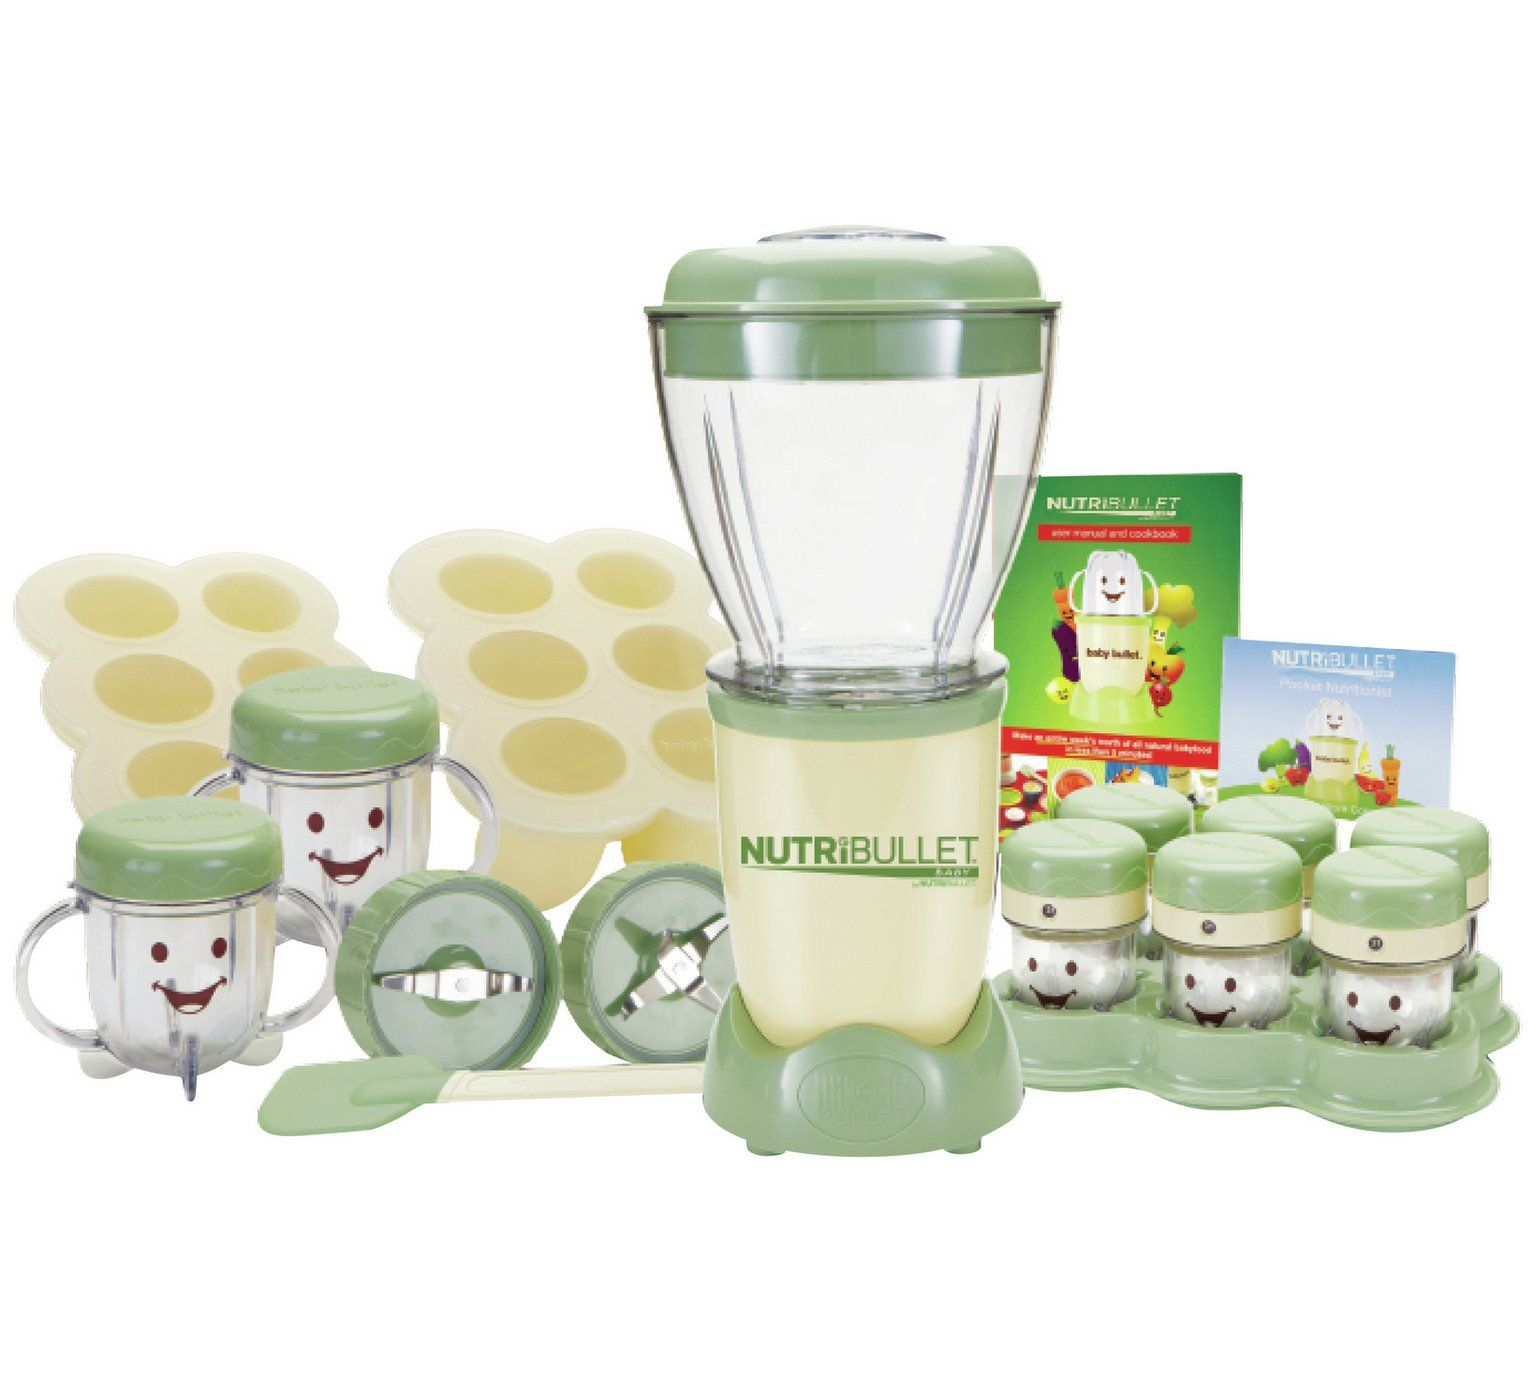 Buy nutribullet baby food processor at argoscouk visit